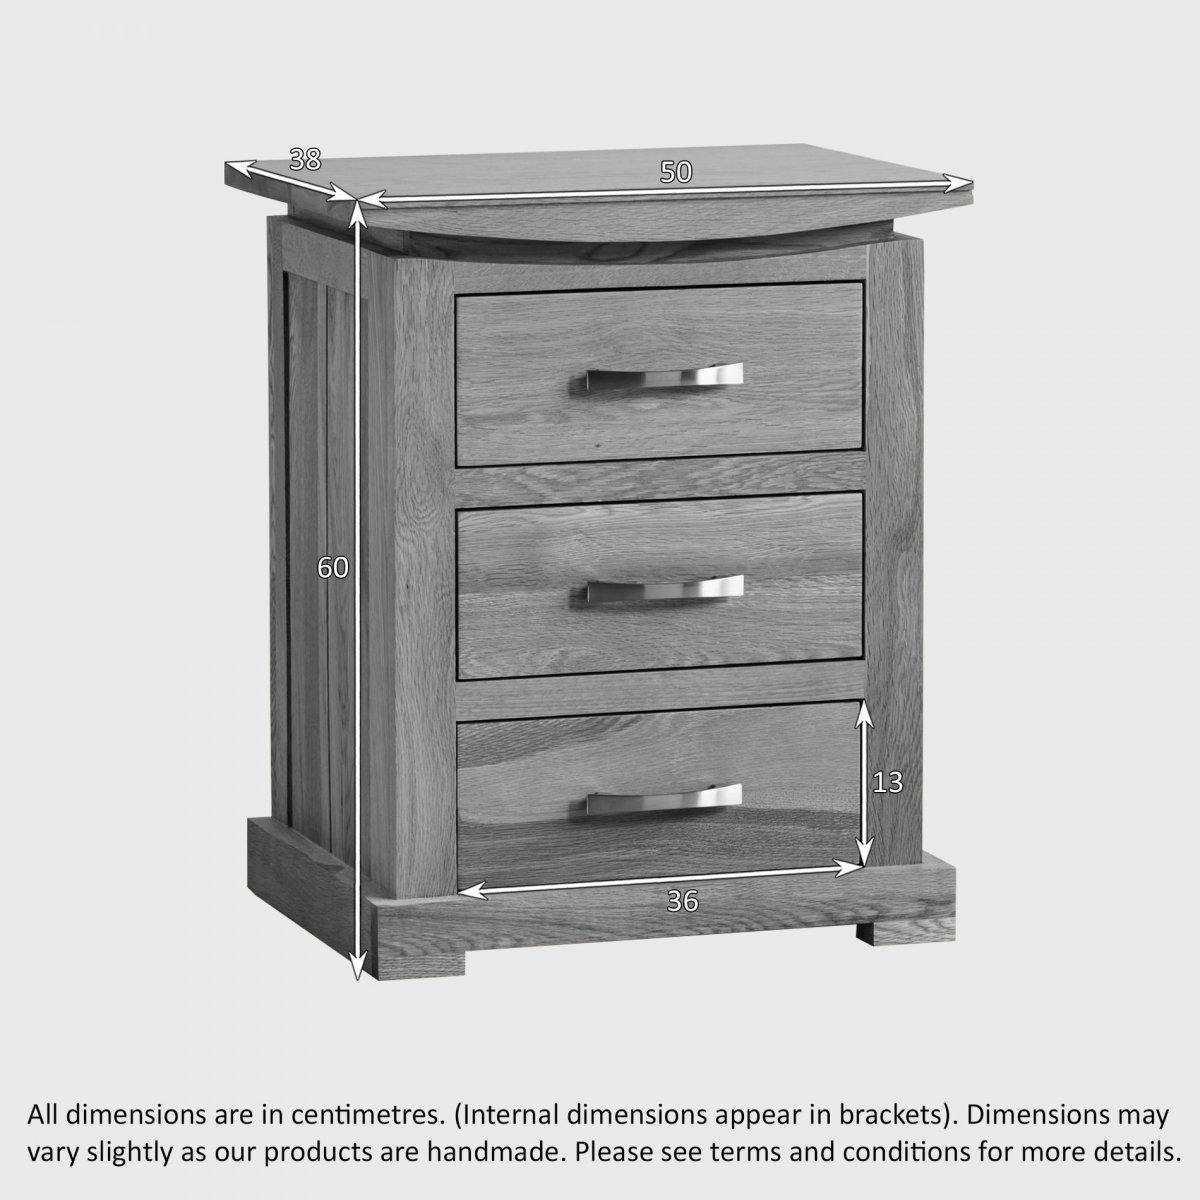 Dresser Drawer Dimensions